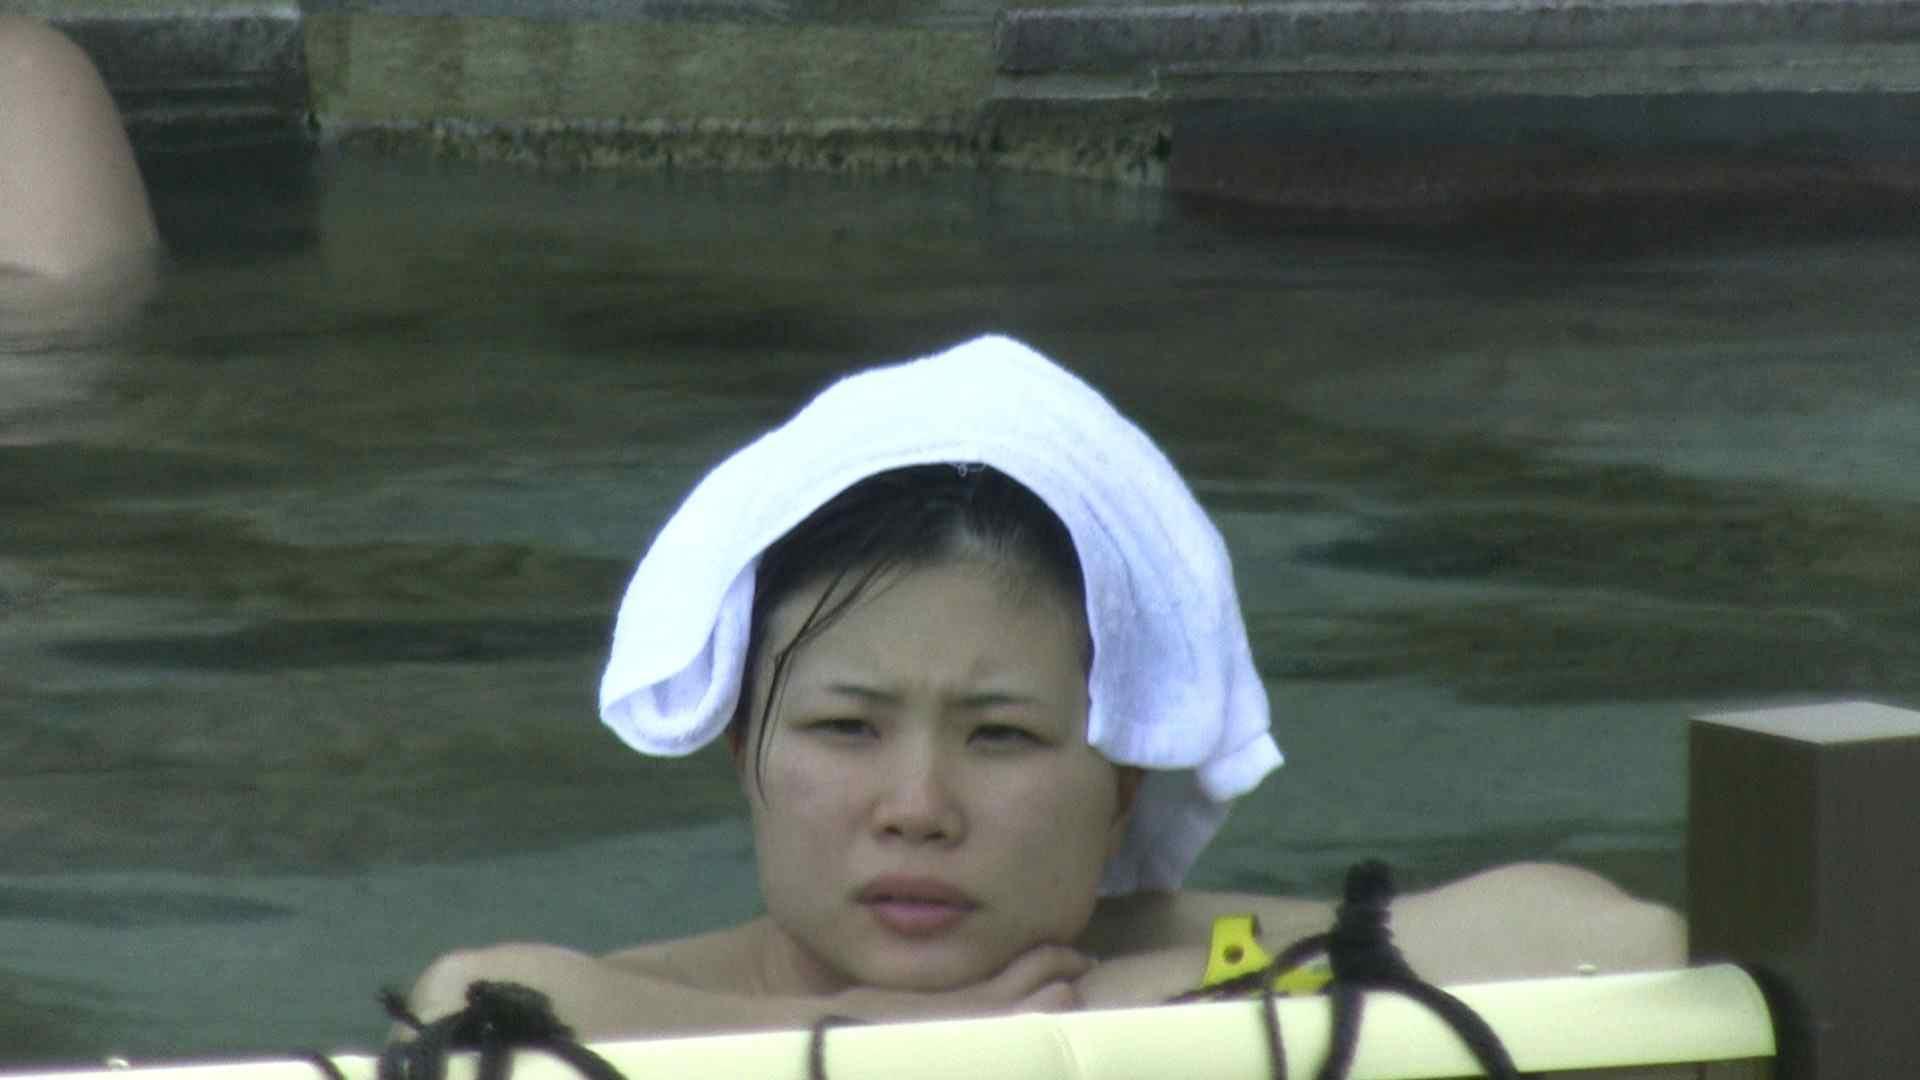 Aquaな露天風呂Vol.183 エッチな盗撮 ワレメ無修正動画無料 106pic 43